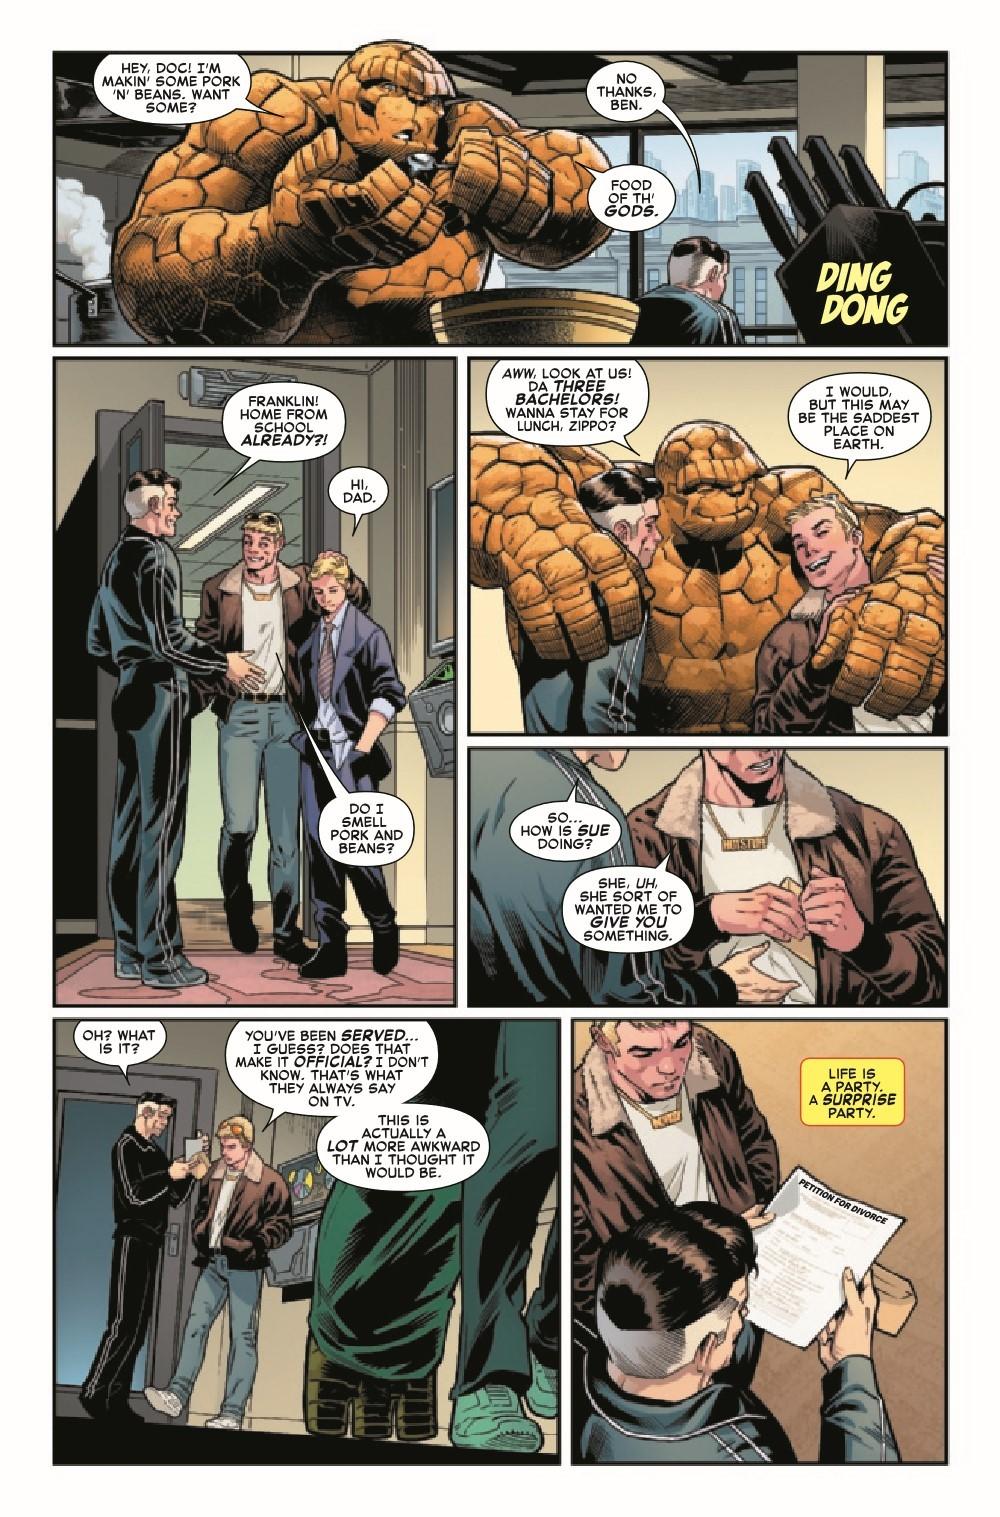 FFLIFESTORY2019003_Preview-5 ComicList Previews: FANTASTIC FOUR LIFE STORY #3 (OF 6)